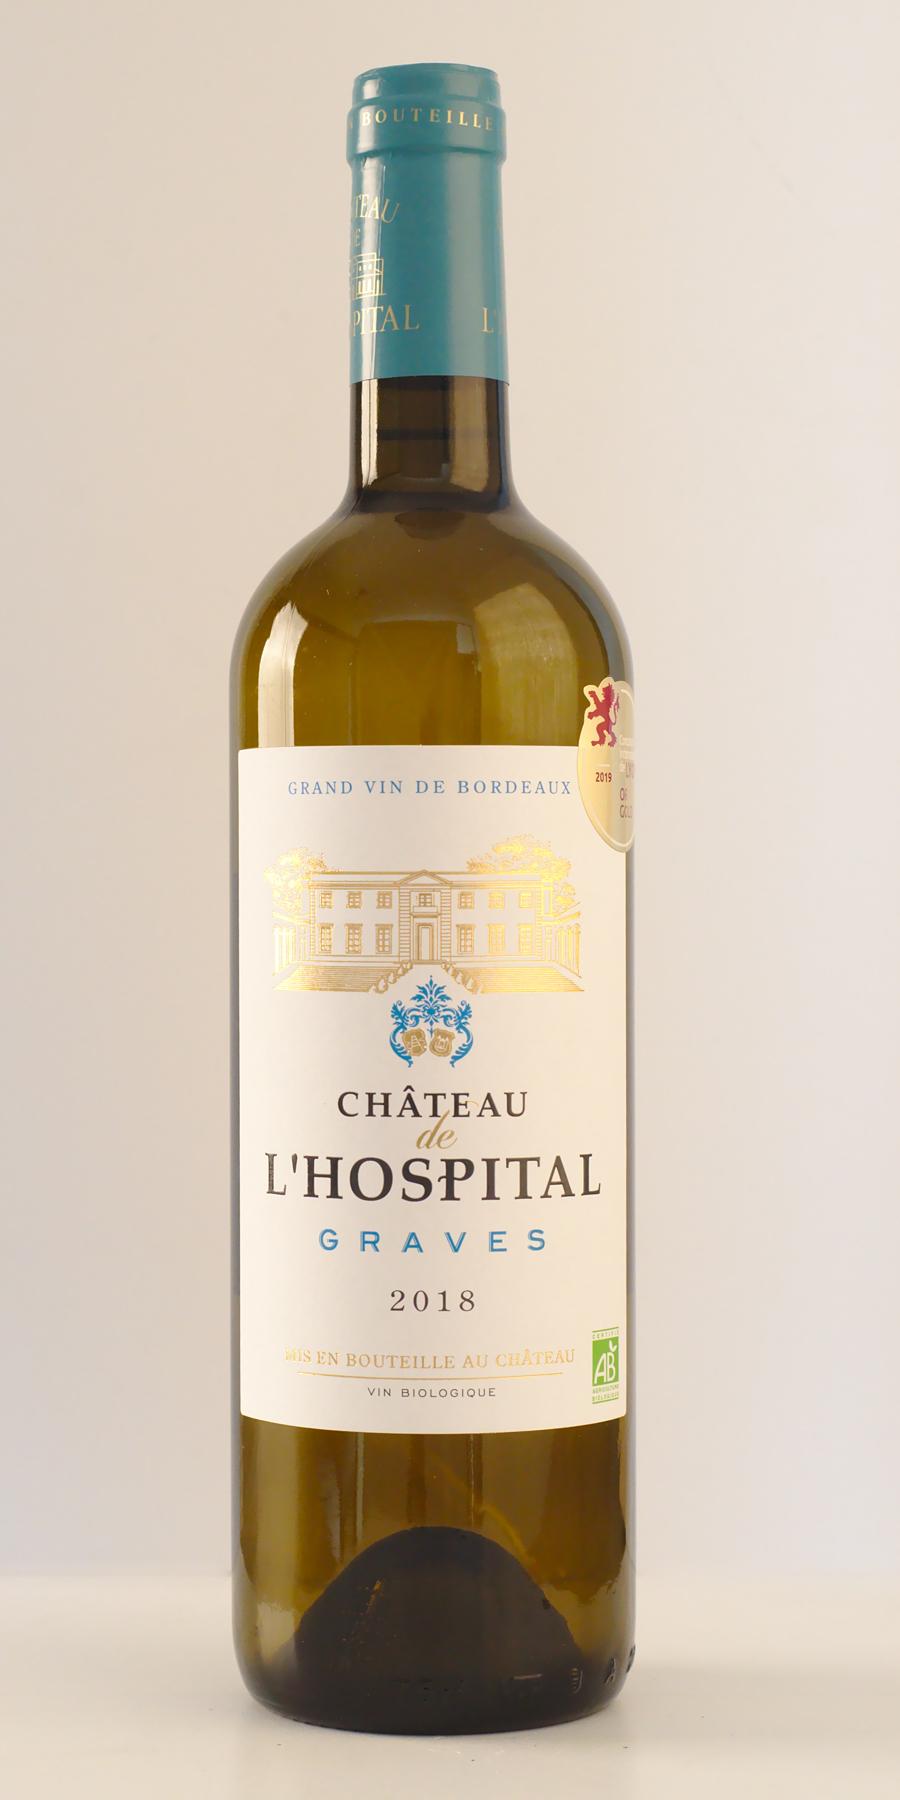 Vin bio graves blanc